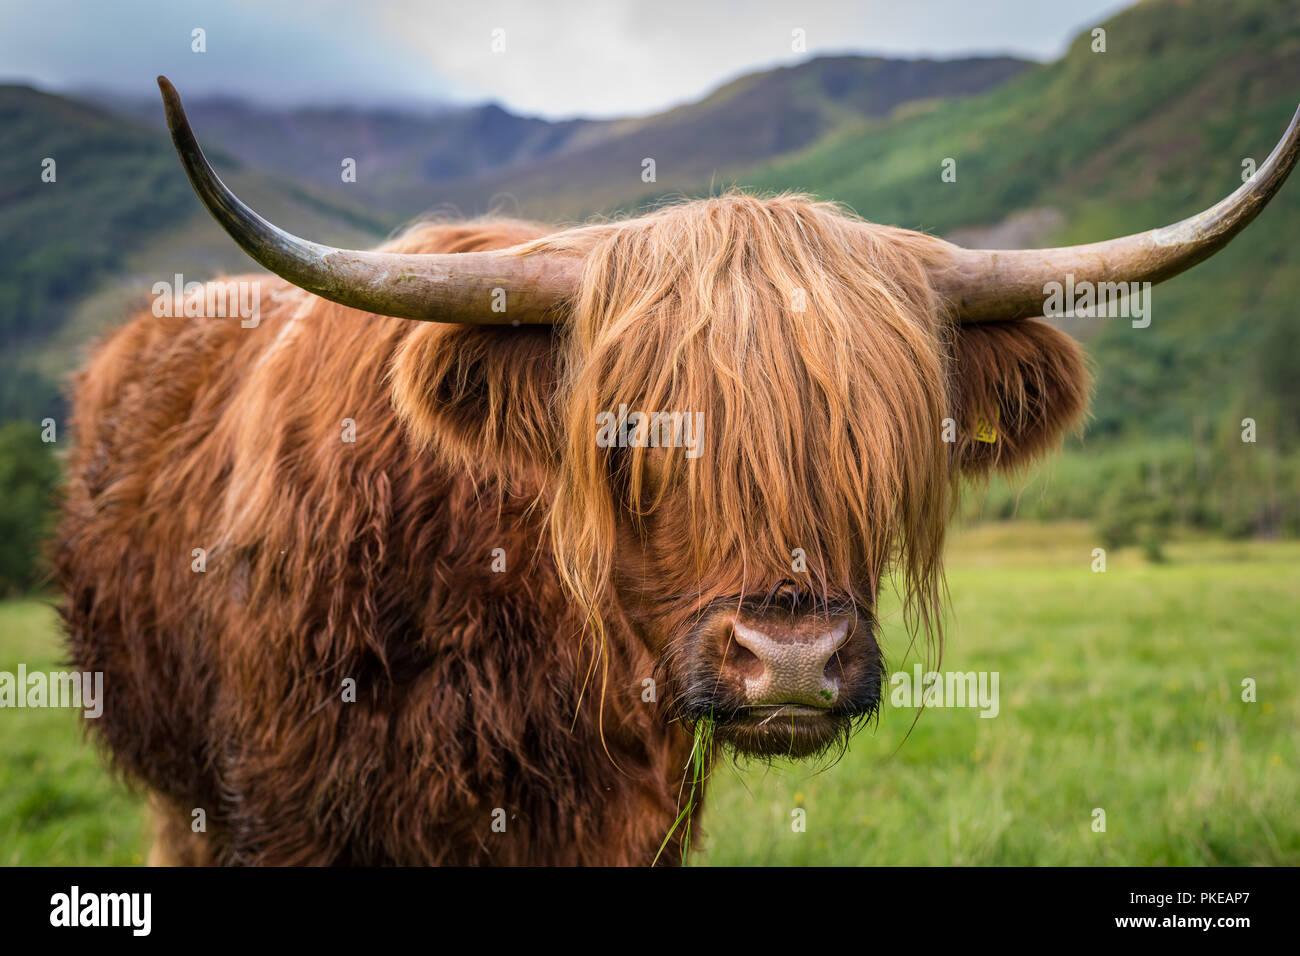 Highland scozzesi bovini, Ben Nevis, Highlands scozzesi, Scotland, Regno Unito Immagini Stock